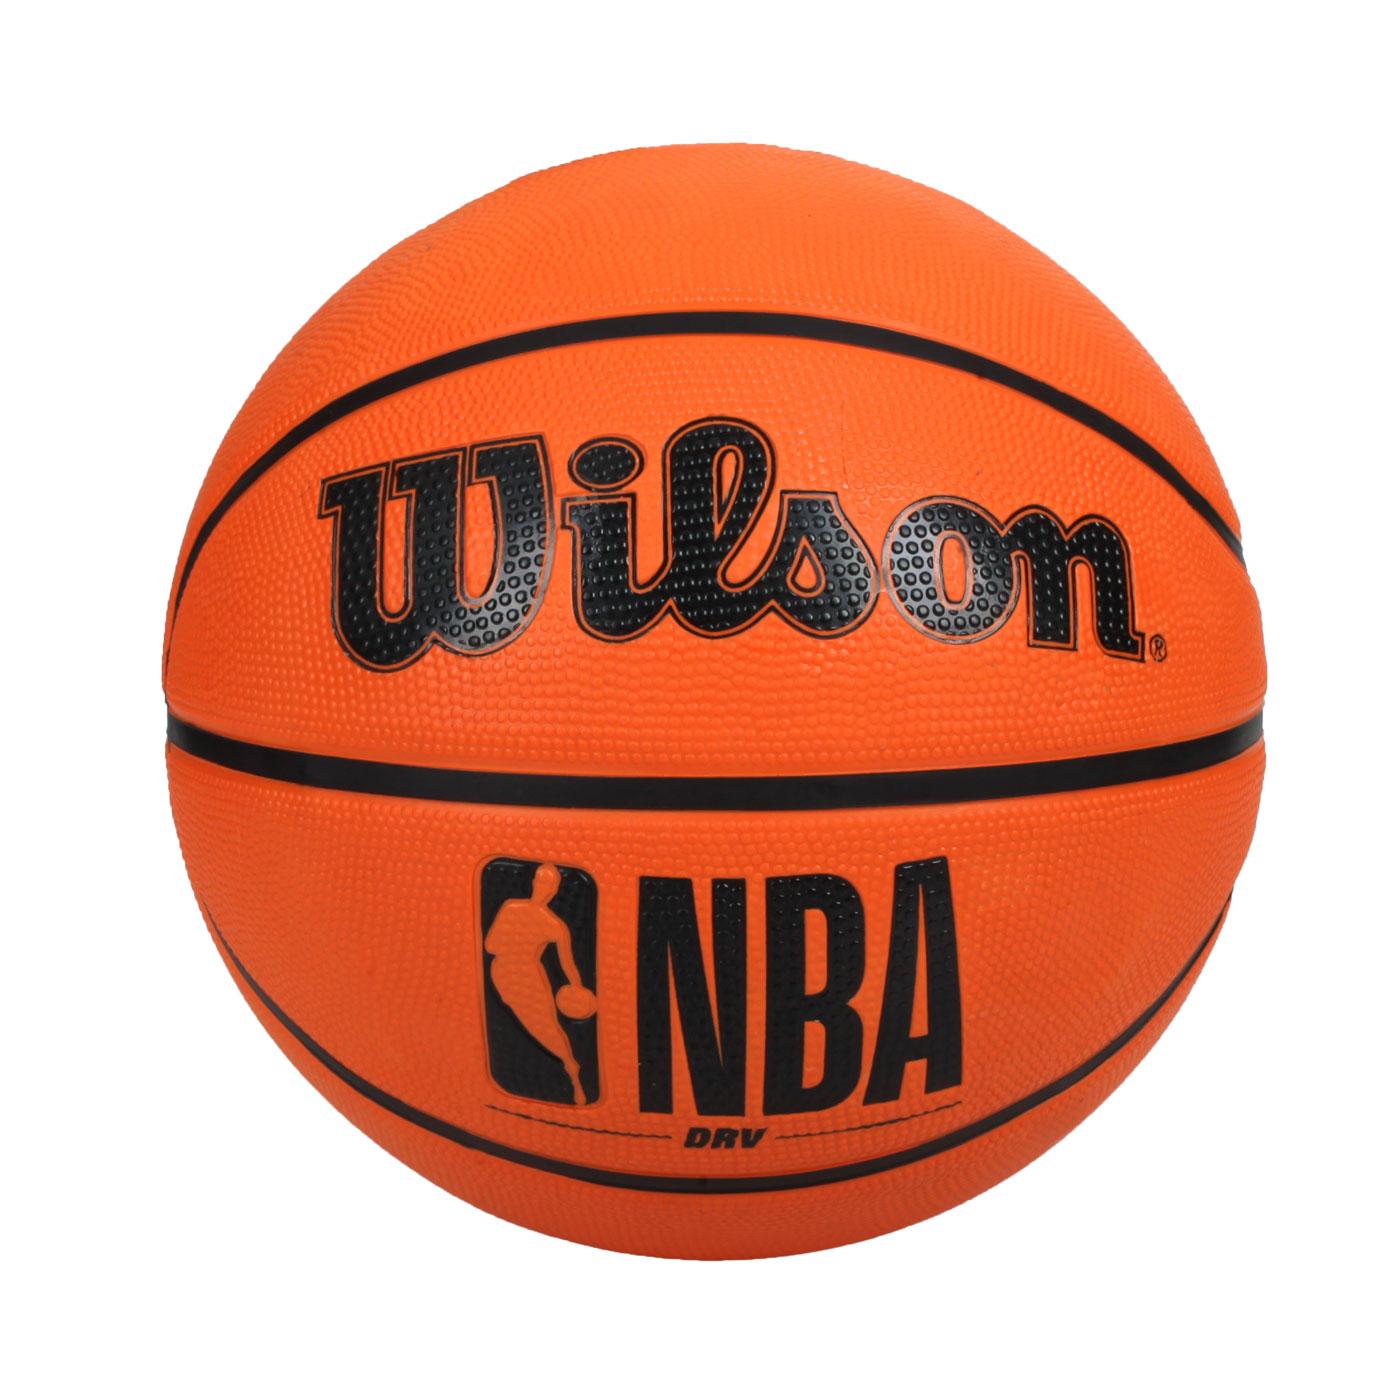 WILSON NBA DRV系列橡膠籃球#6 WTB9300XB06 - 橘黑